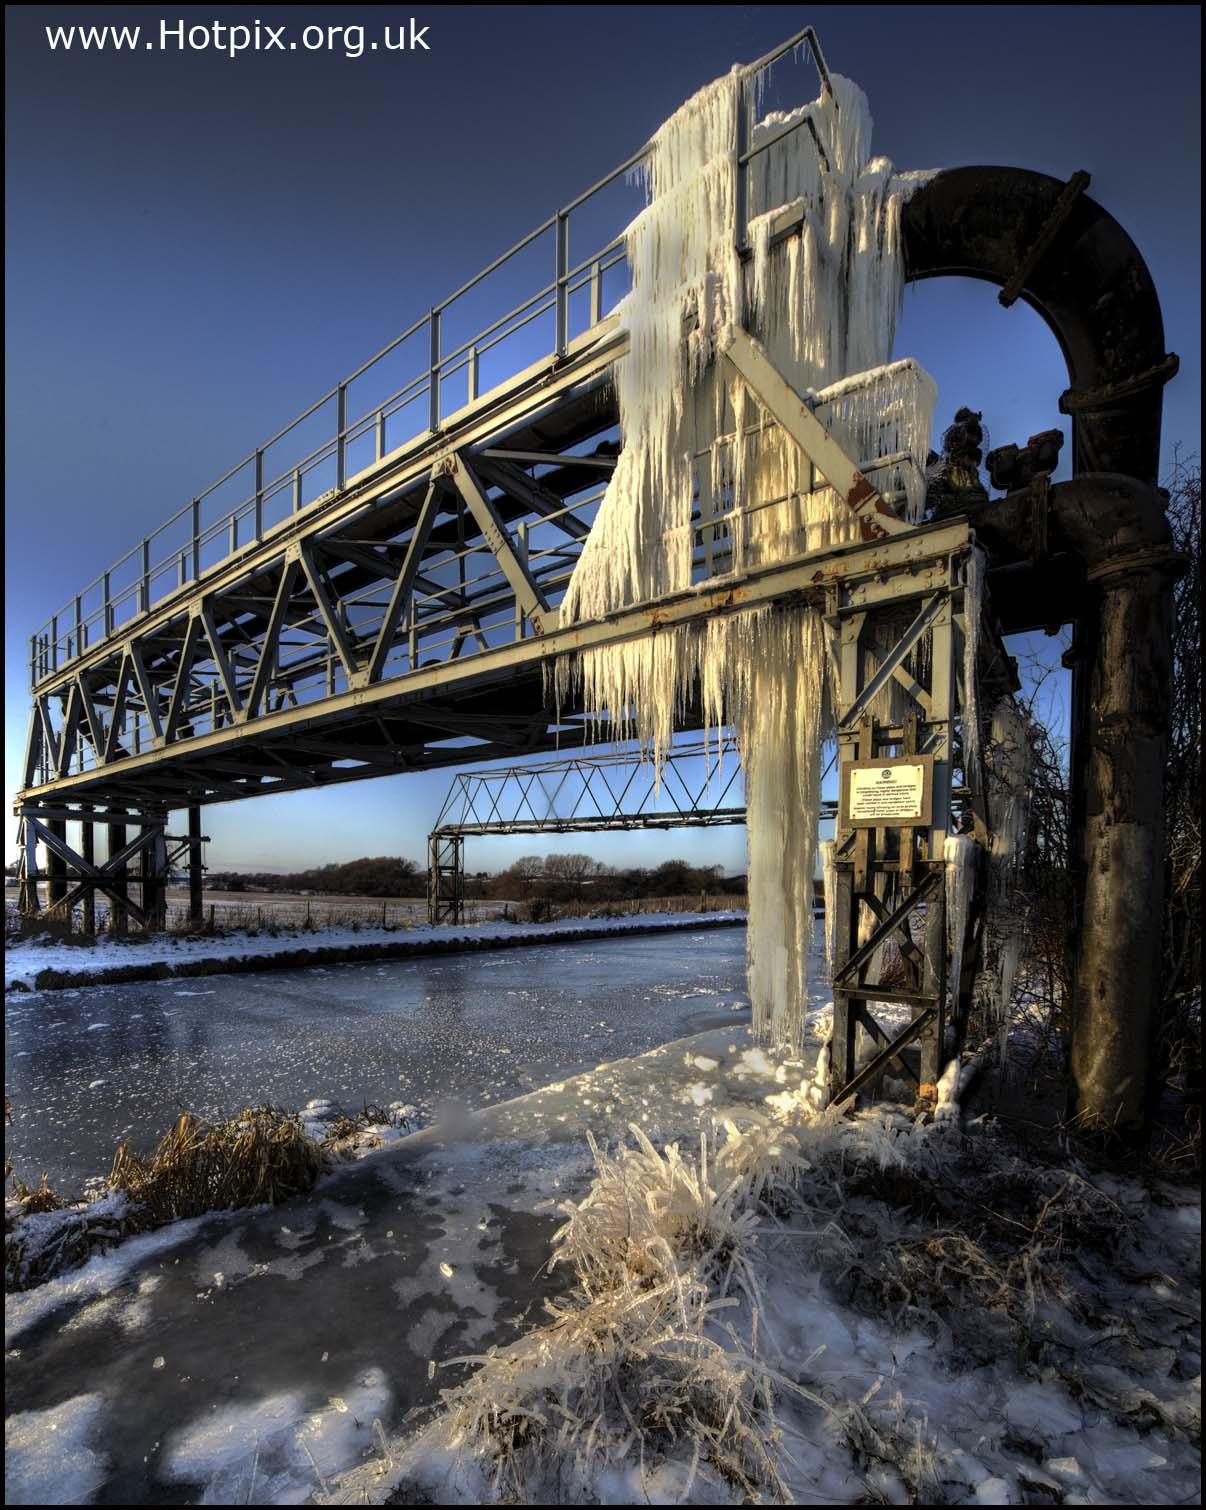 serious,icicles,ice,water,winter,cold,sheet,pipes,industry,industrial,northwich,cheshire,uk,january,2010,england,freeze,blue,sky,grass,sub,zero,subzero,hotpix,hoypixuk,tonysmith,tony,smith,bridge,gantry,walkway,navigation,navigable,waterway,way,rudheath,orchard,boat,yard,boatyard,car\u00e1mbano,del,hielo,helado,this photo rocks,HDR,high dynamic range,interesting,place,places,12-24,sigma,wide angle lens,wide